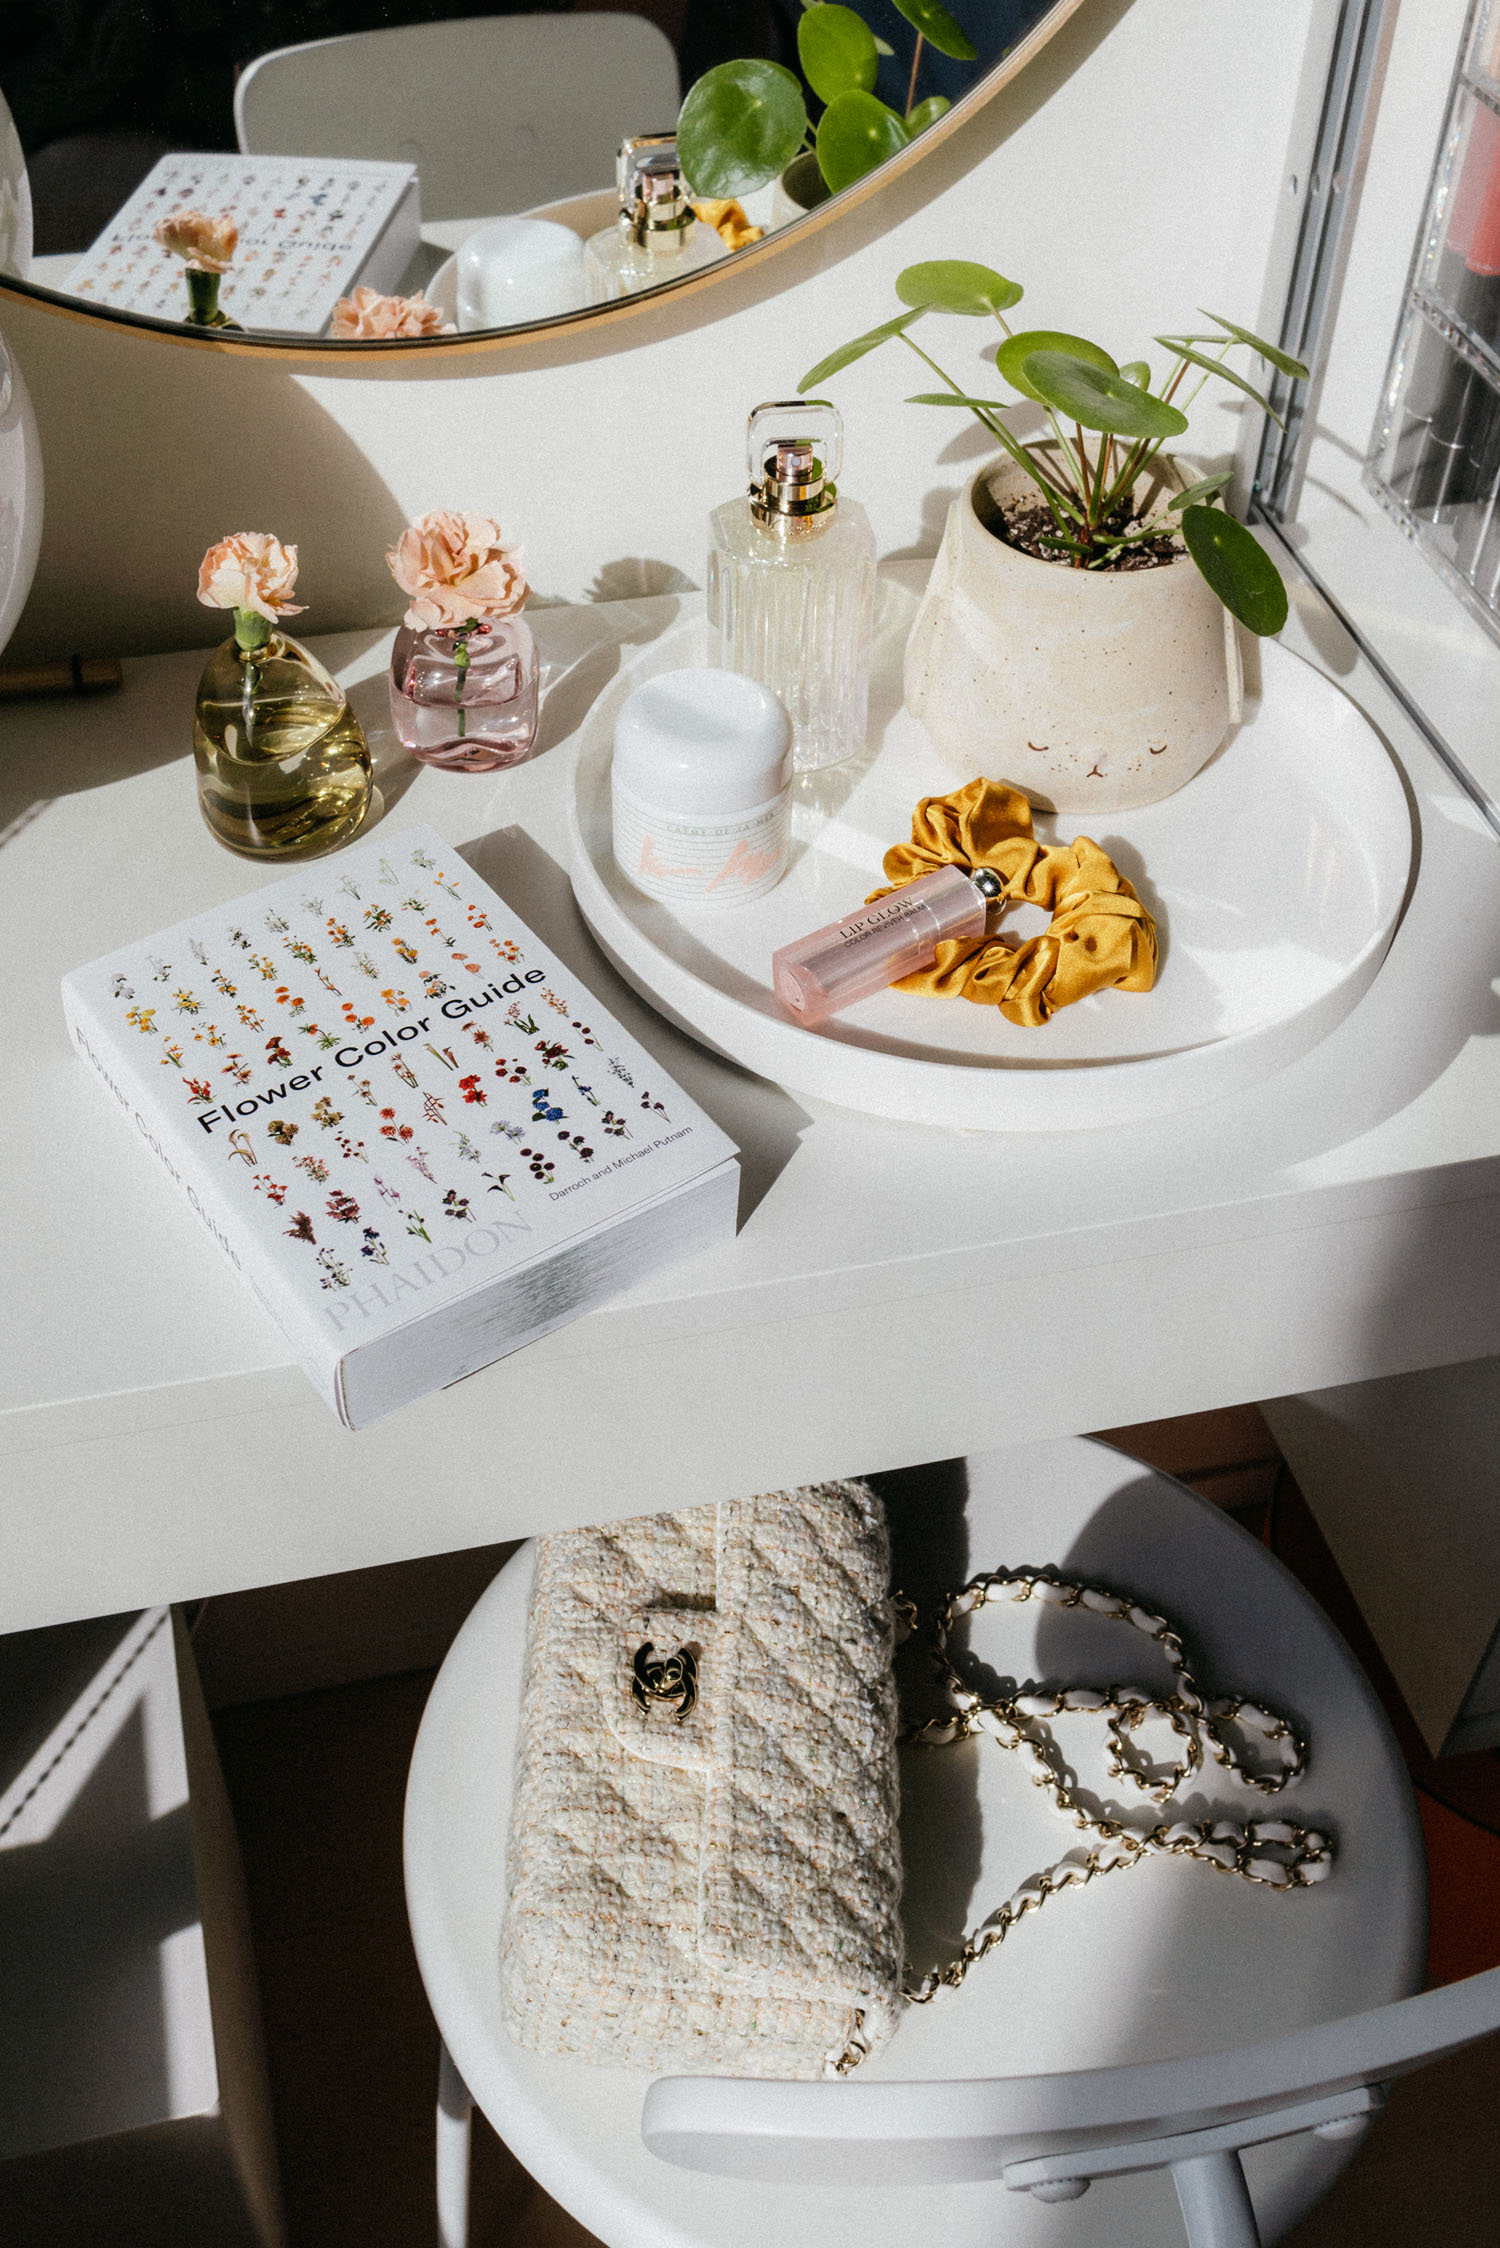 Flower Color Guide ,  Sunday Mornings Vases ,  La Mer Cream ,  Cartier Fragrance ,  Dior Lip Glow ,  Donni Scrunchy ,  Chanel Bag